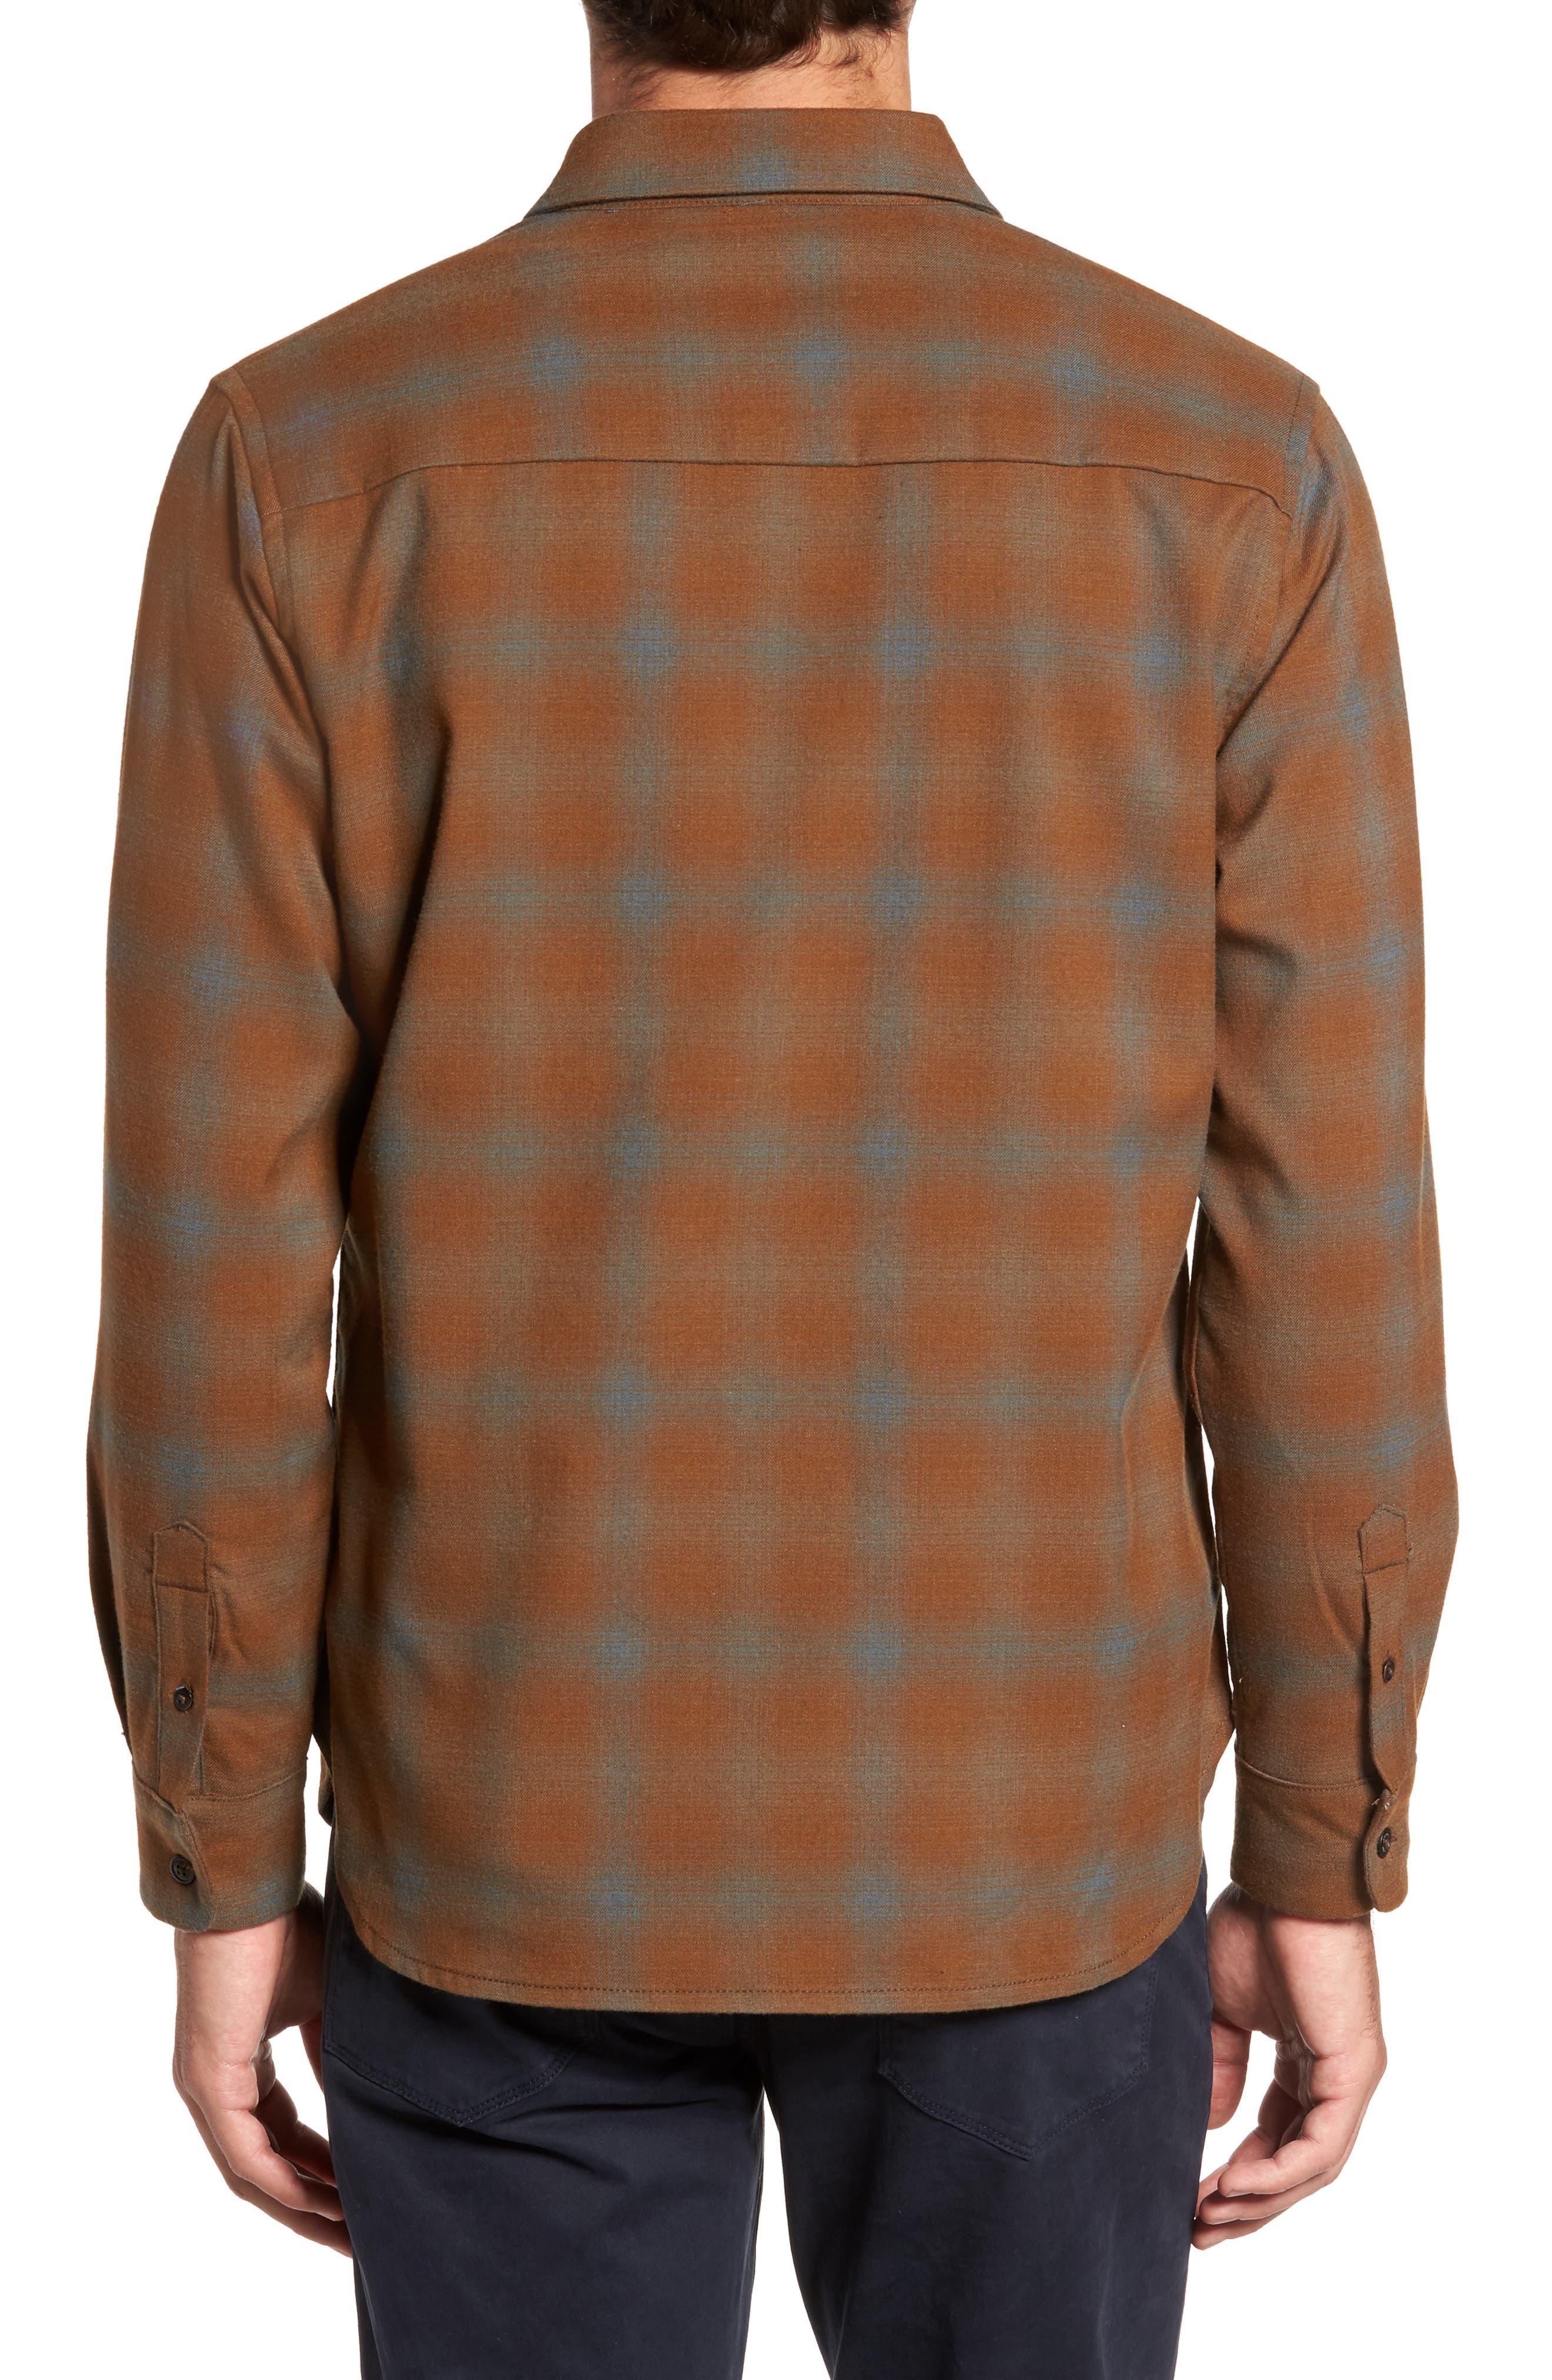 Peak Flannel Sport Shirt,                             Alternate thumbnail 2, color,                             215